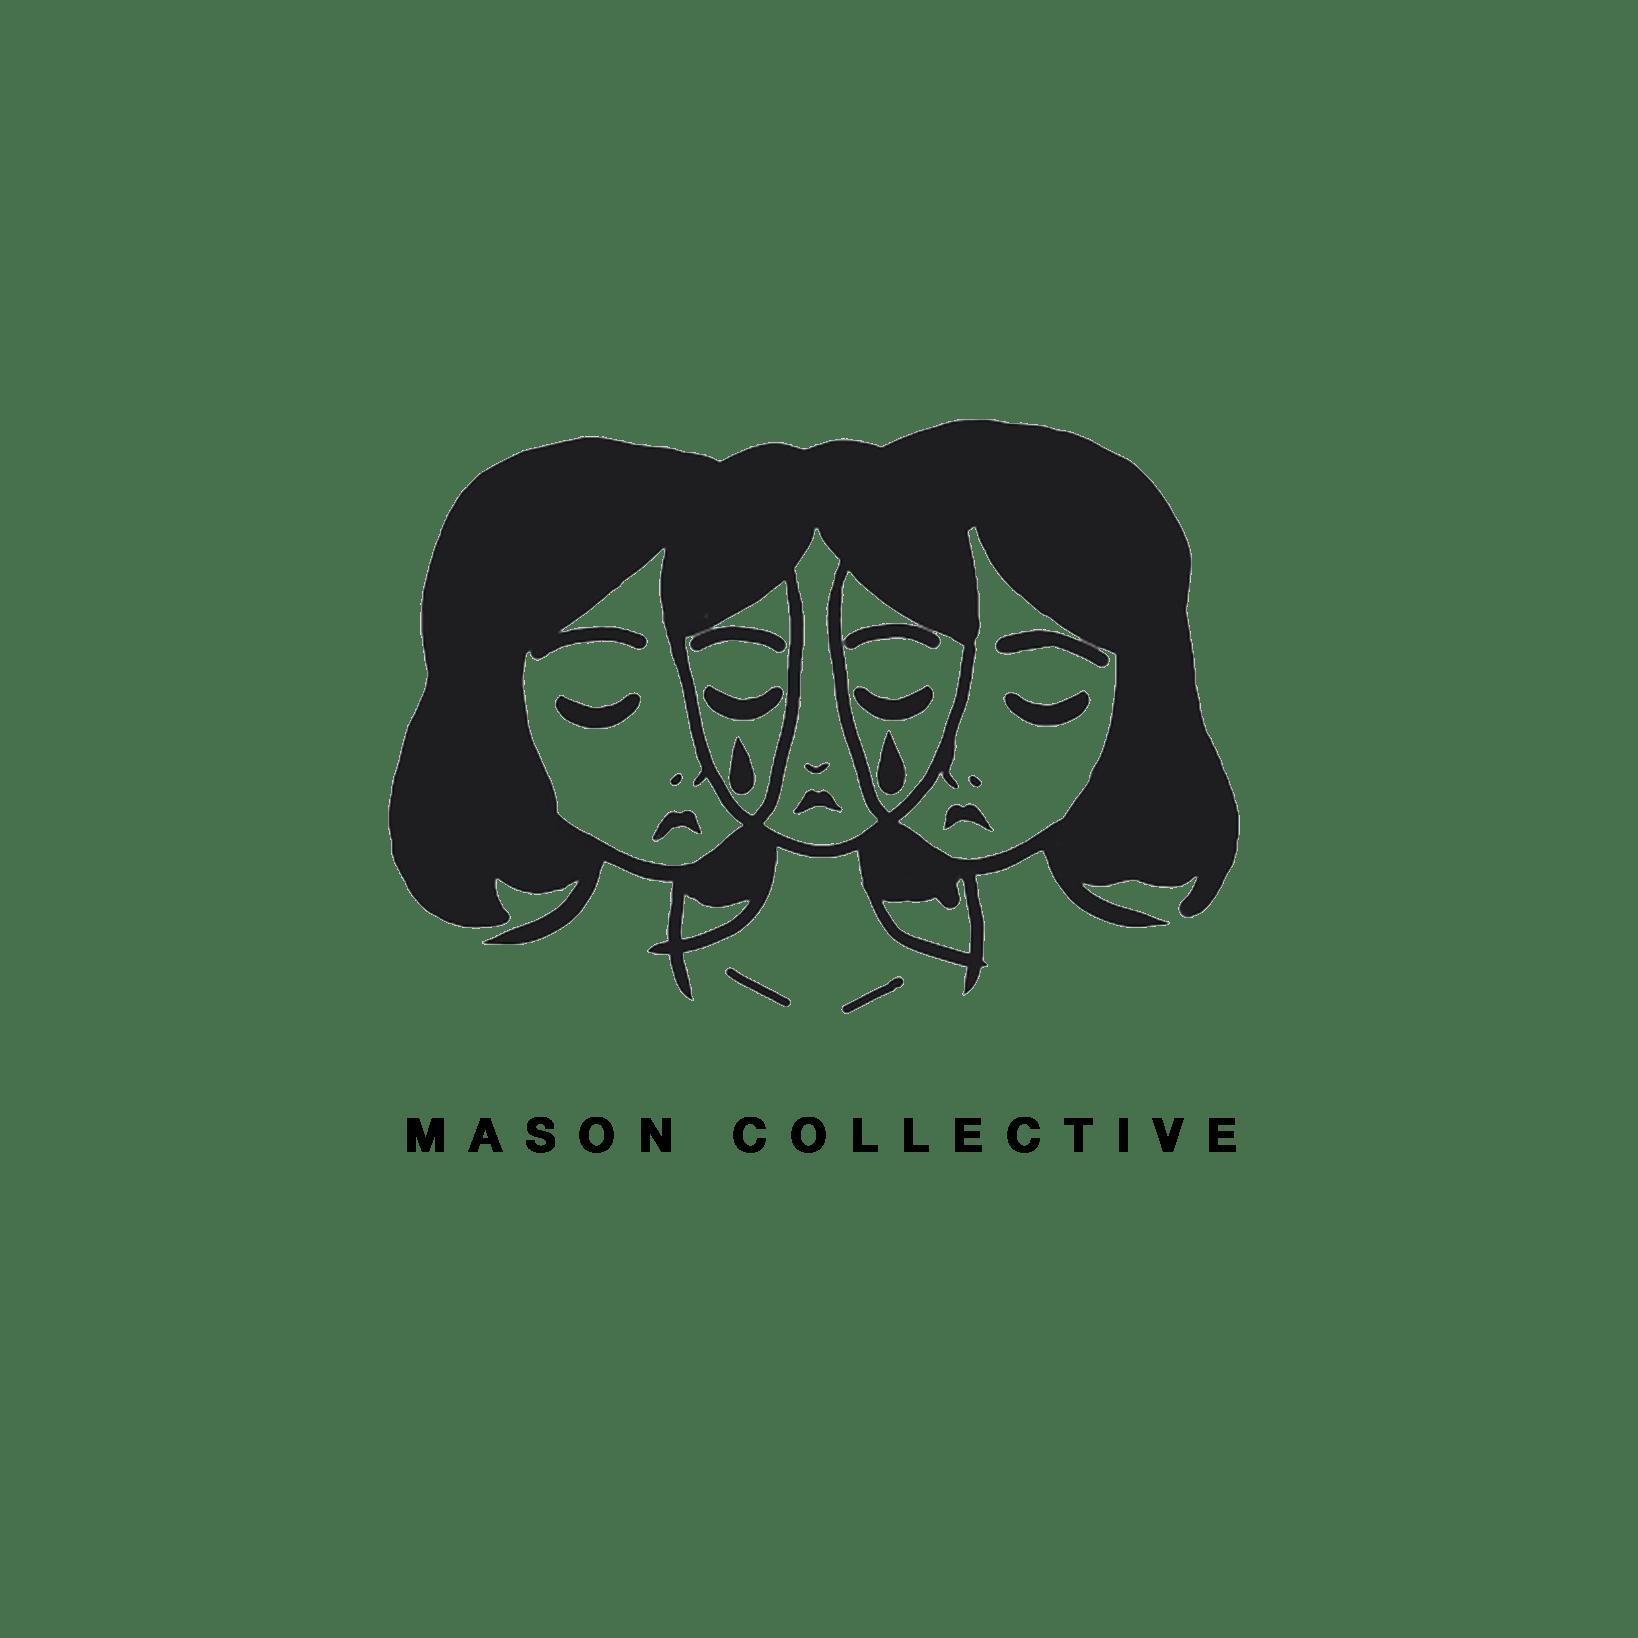 mvson-collective-logo.png